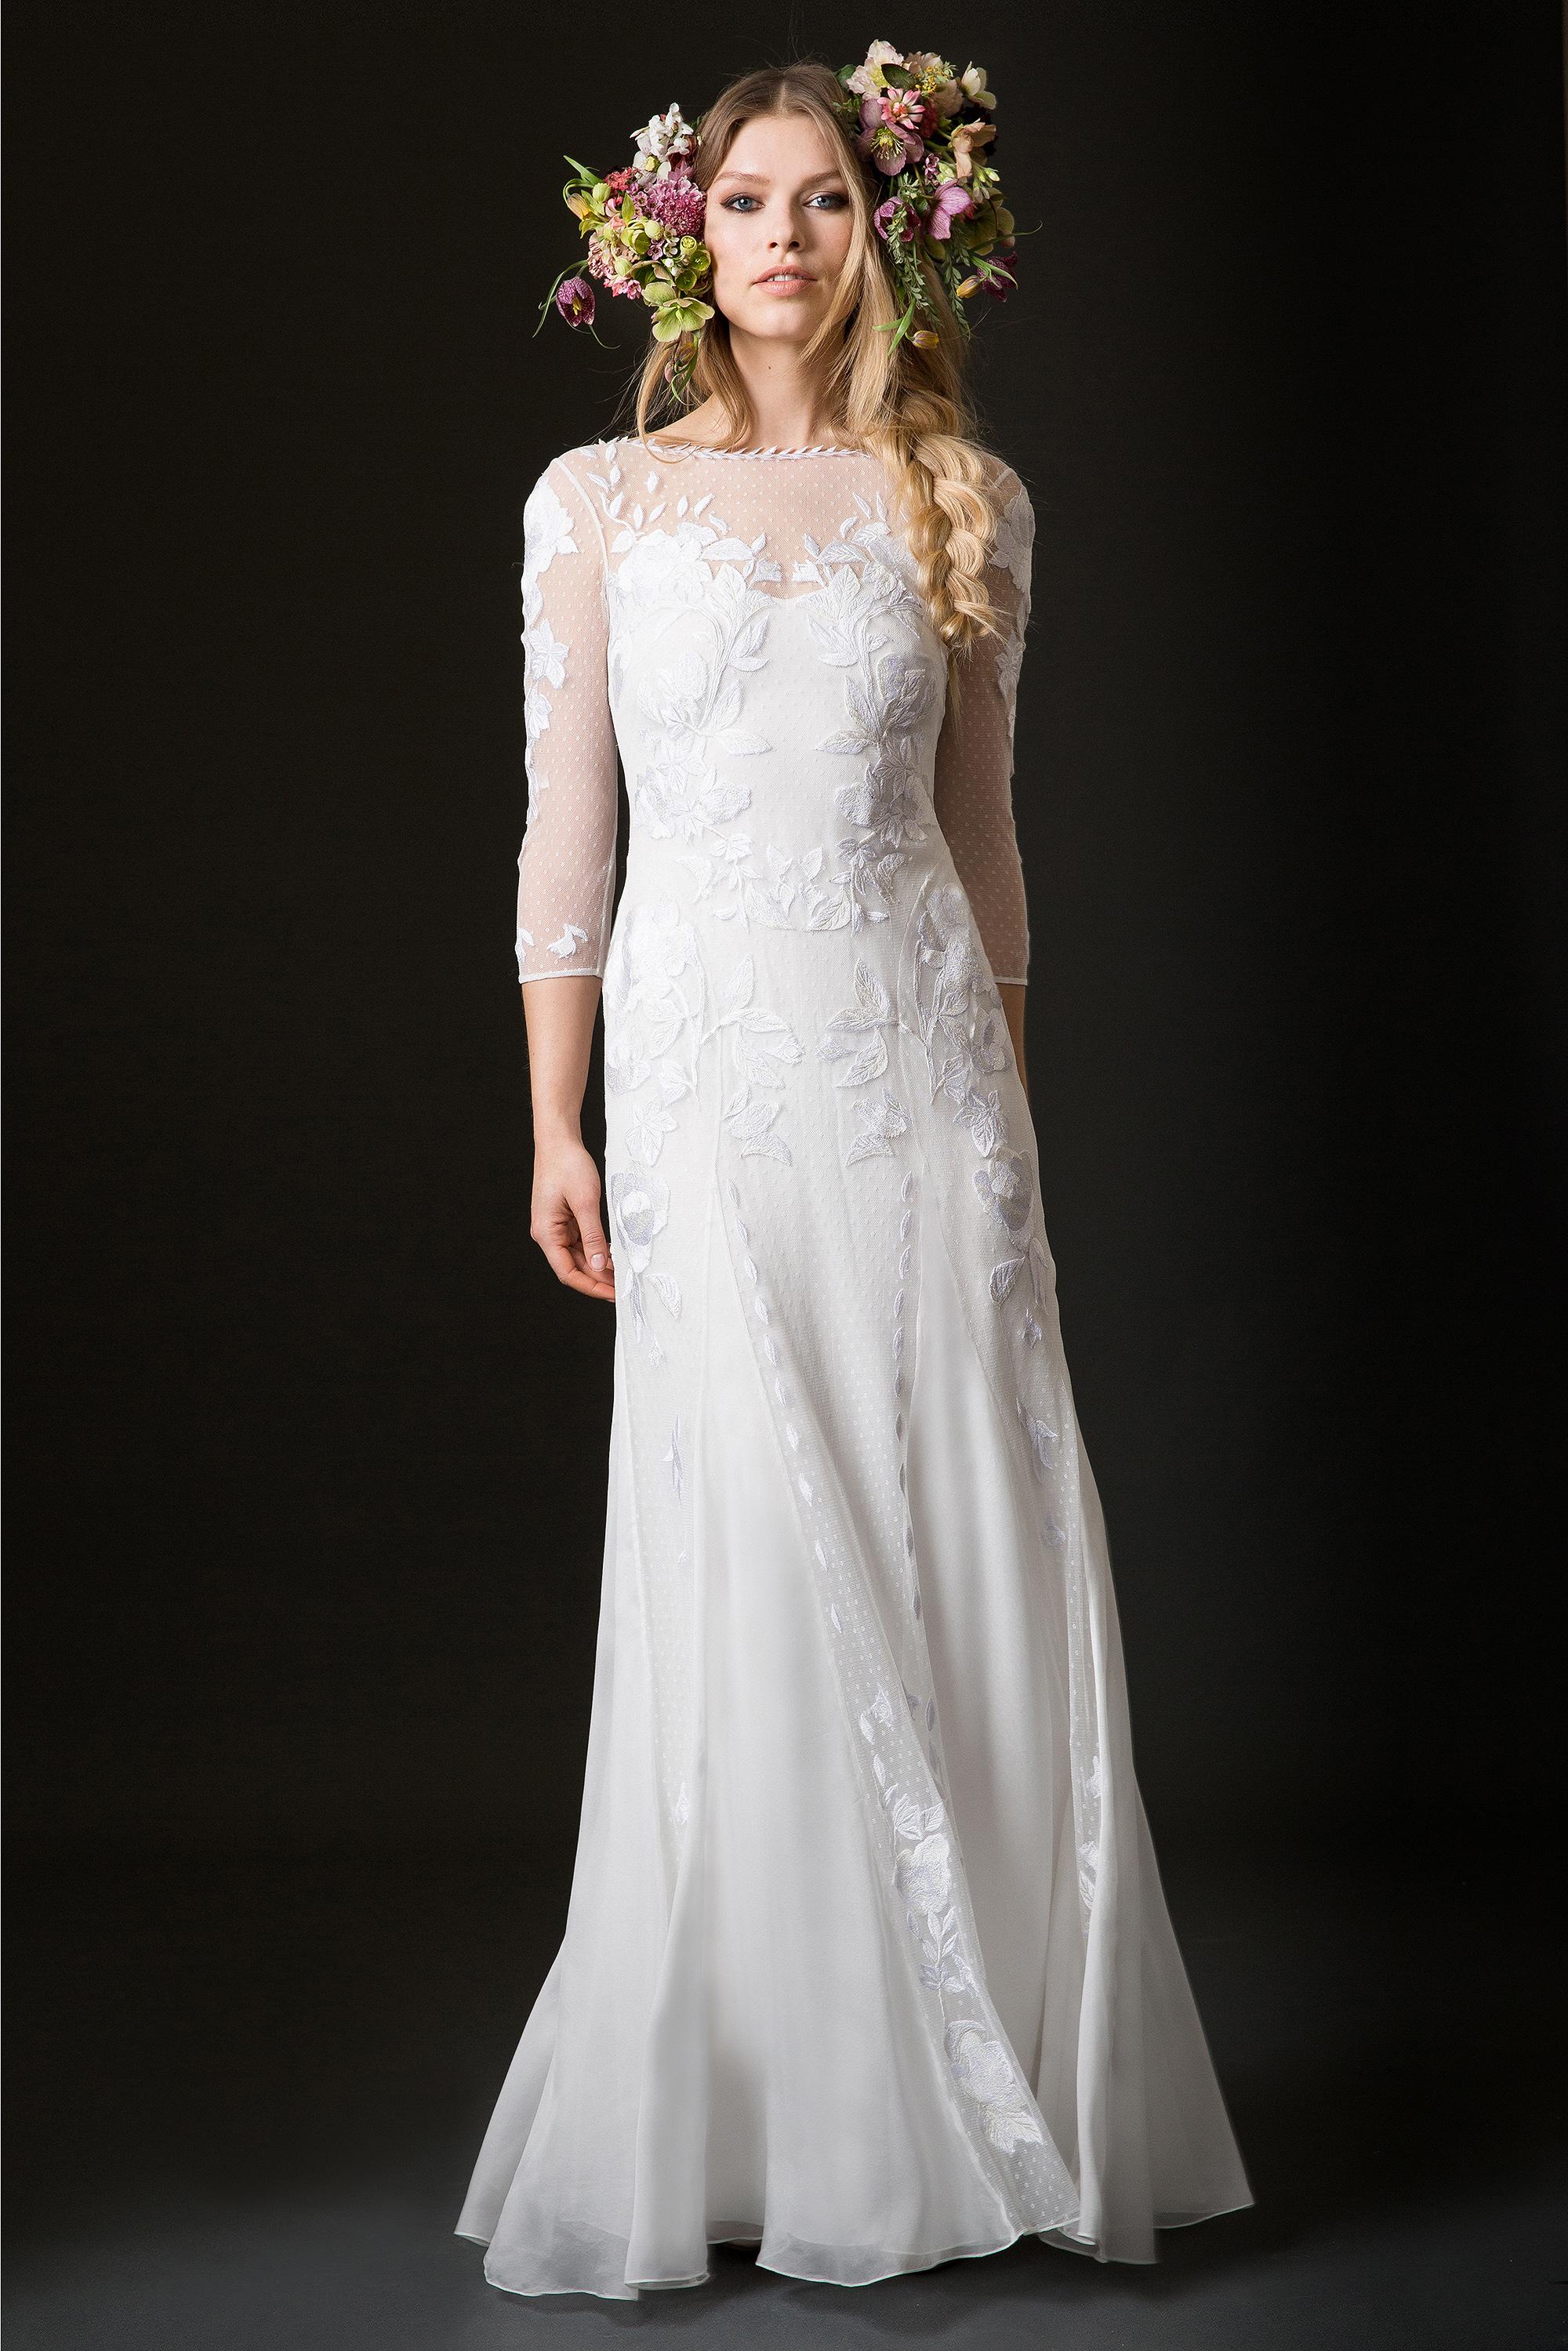 temperley wedding dress spring 2019 high neck sheath with three-quarter length sleeves